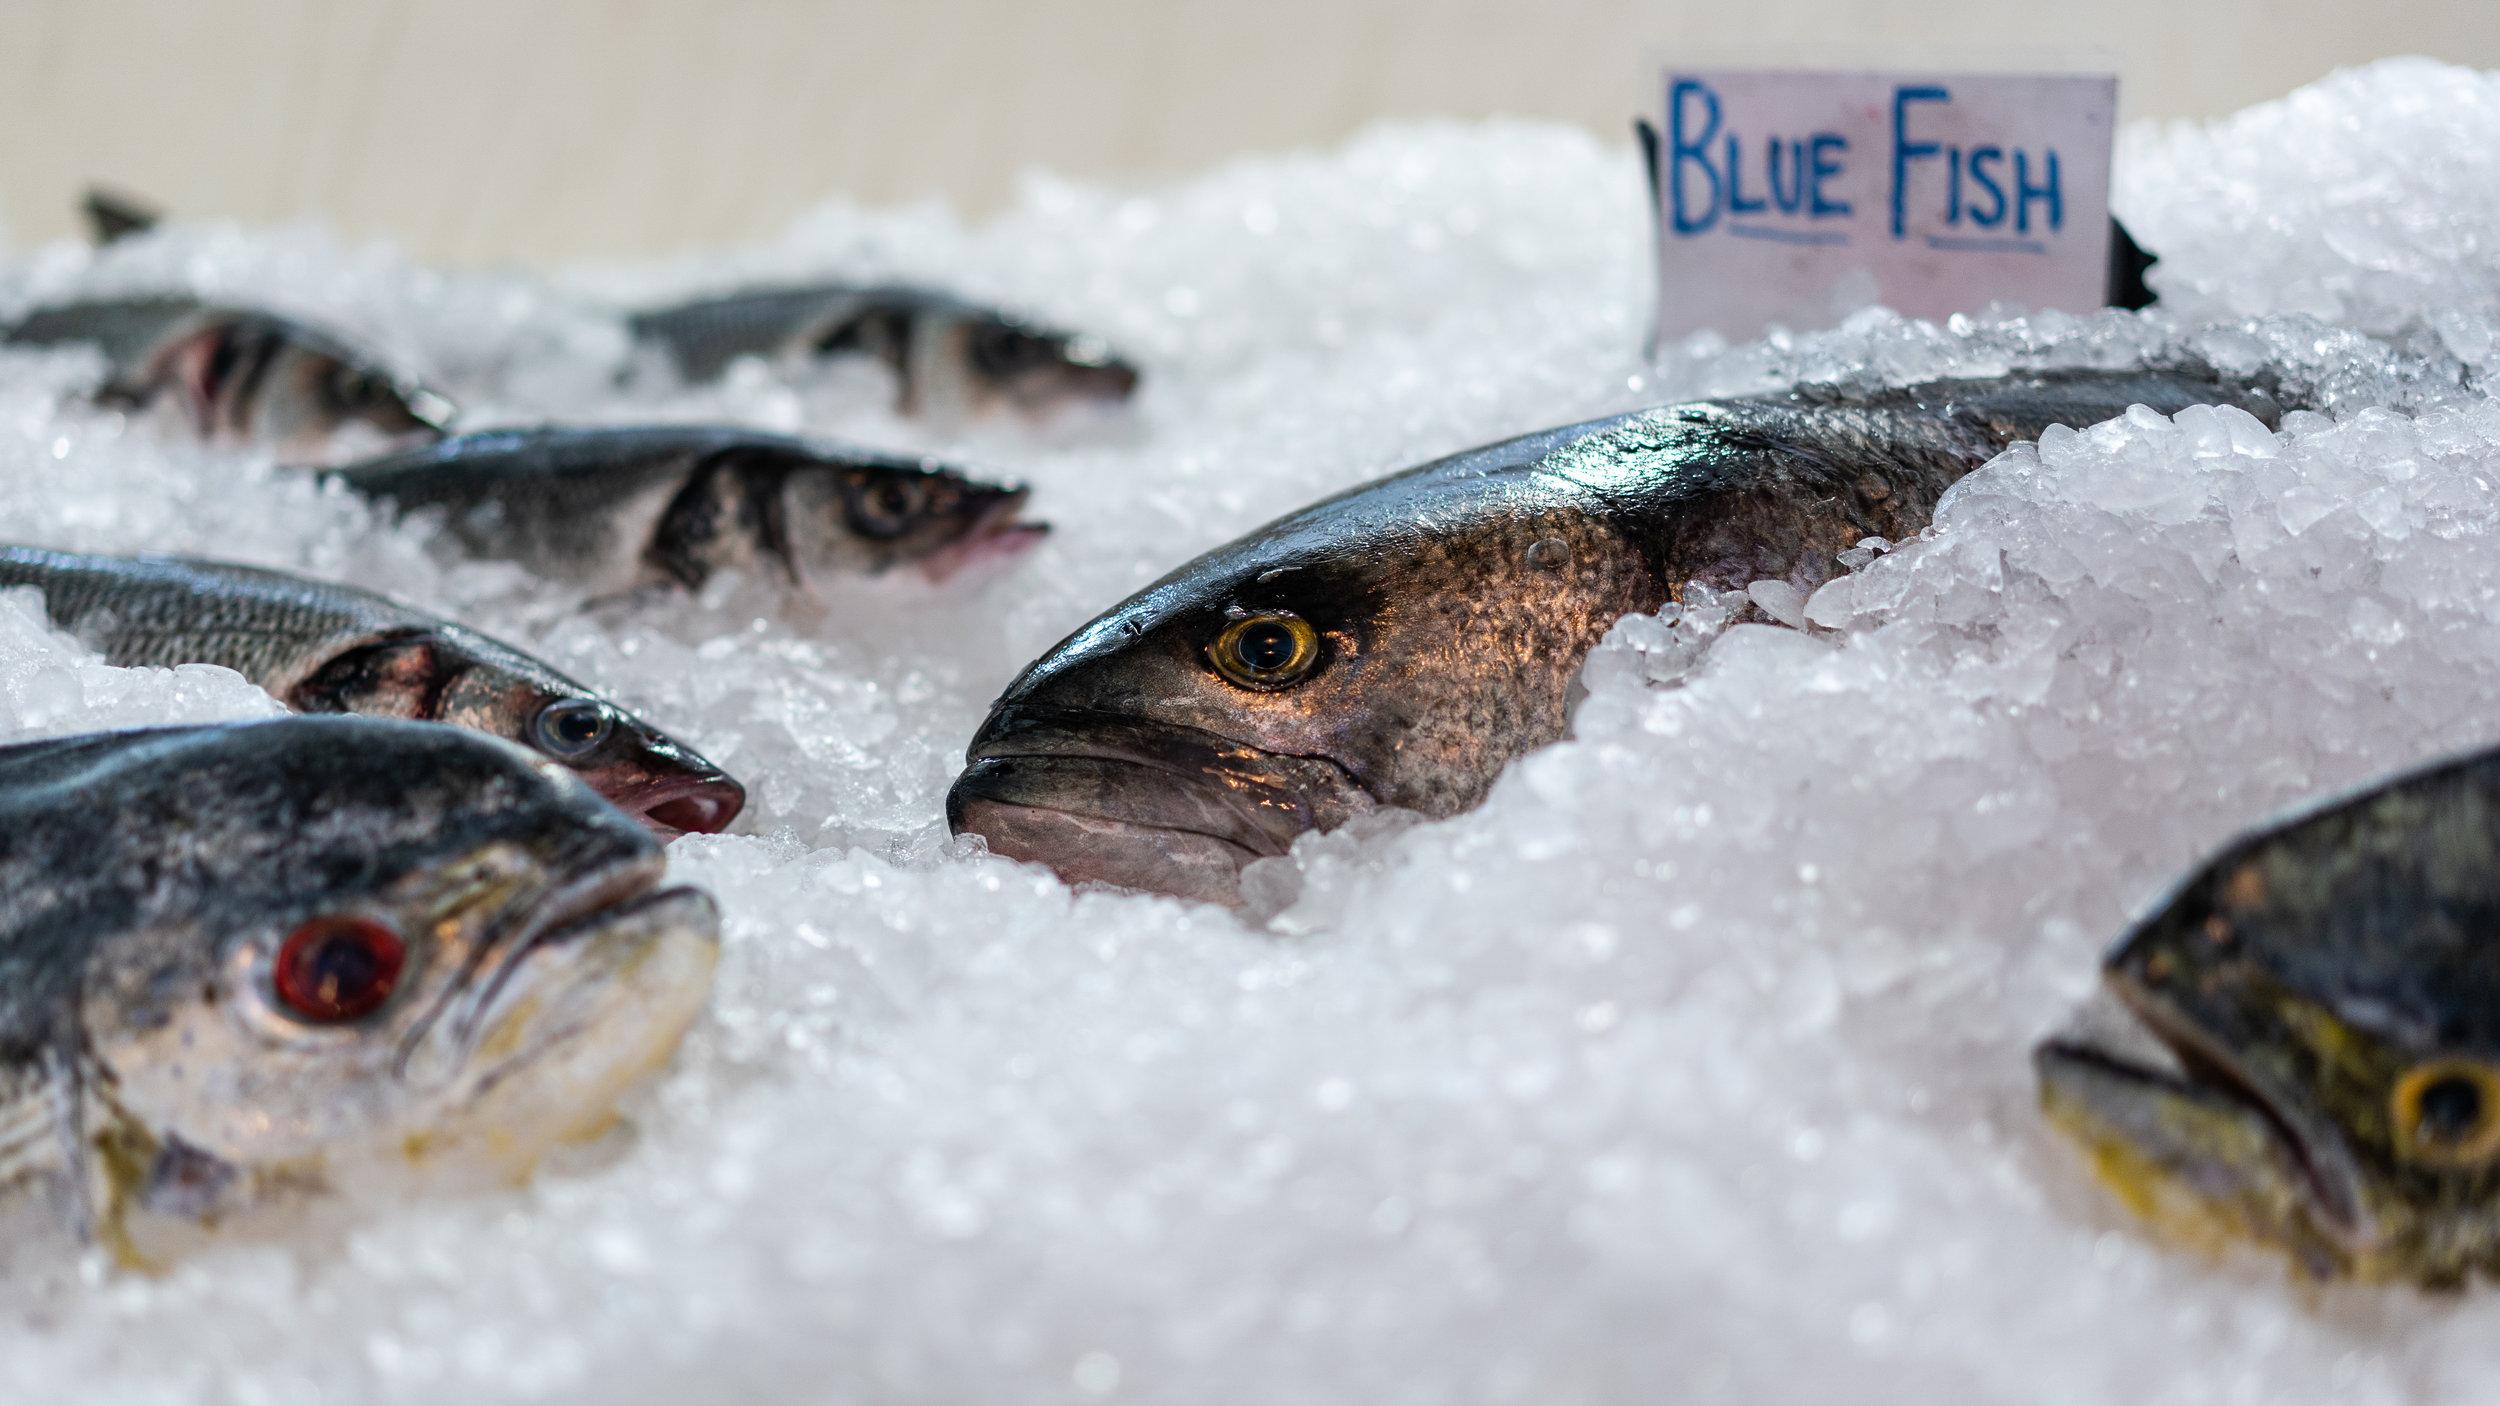 Blue Fish-1.jpg